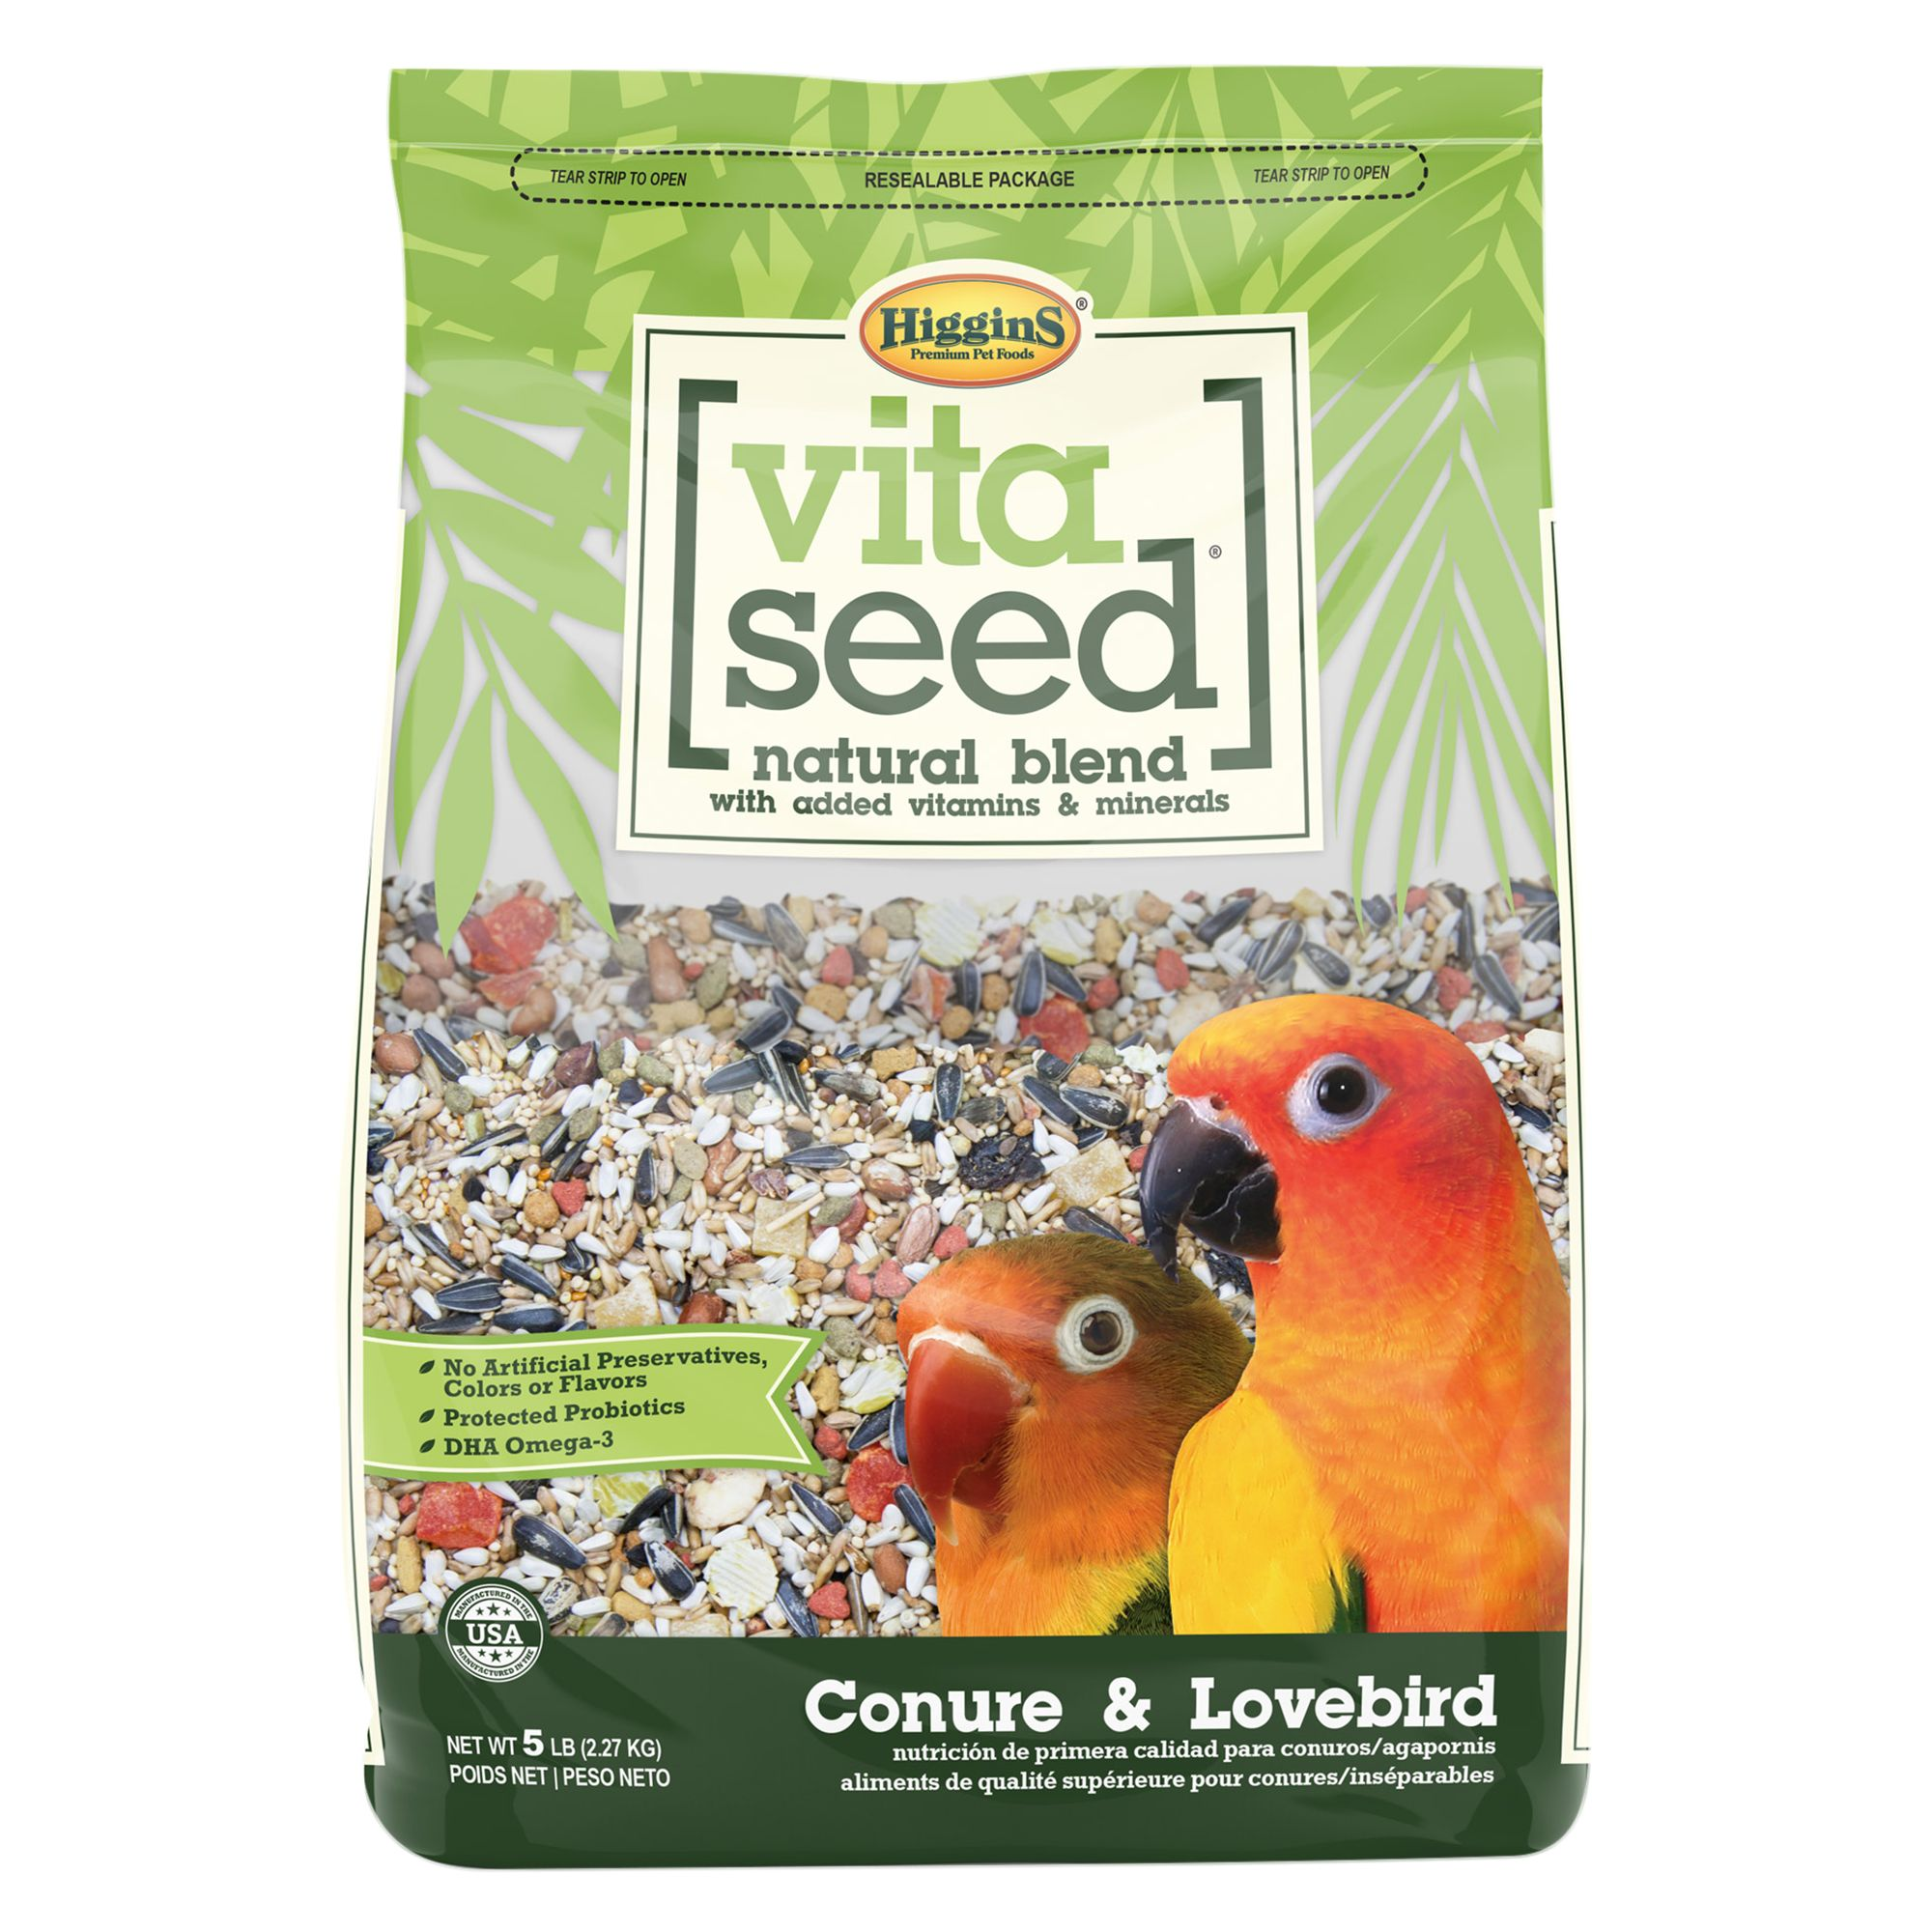 Higgins Vita Seed Conure and Lovebird Food size: 5 Lb 5262917